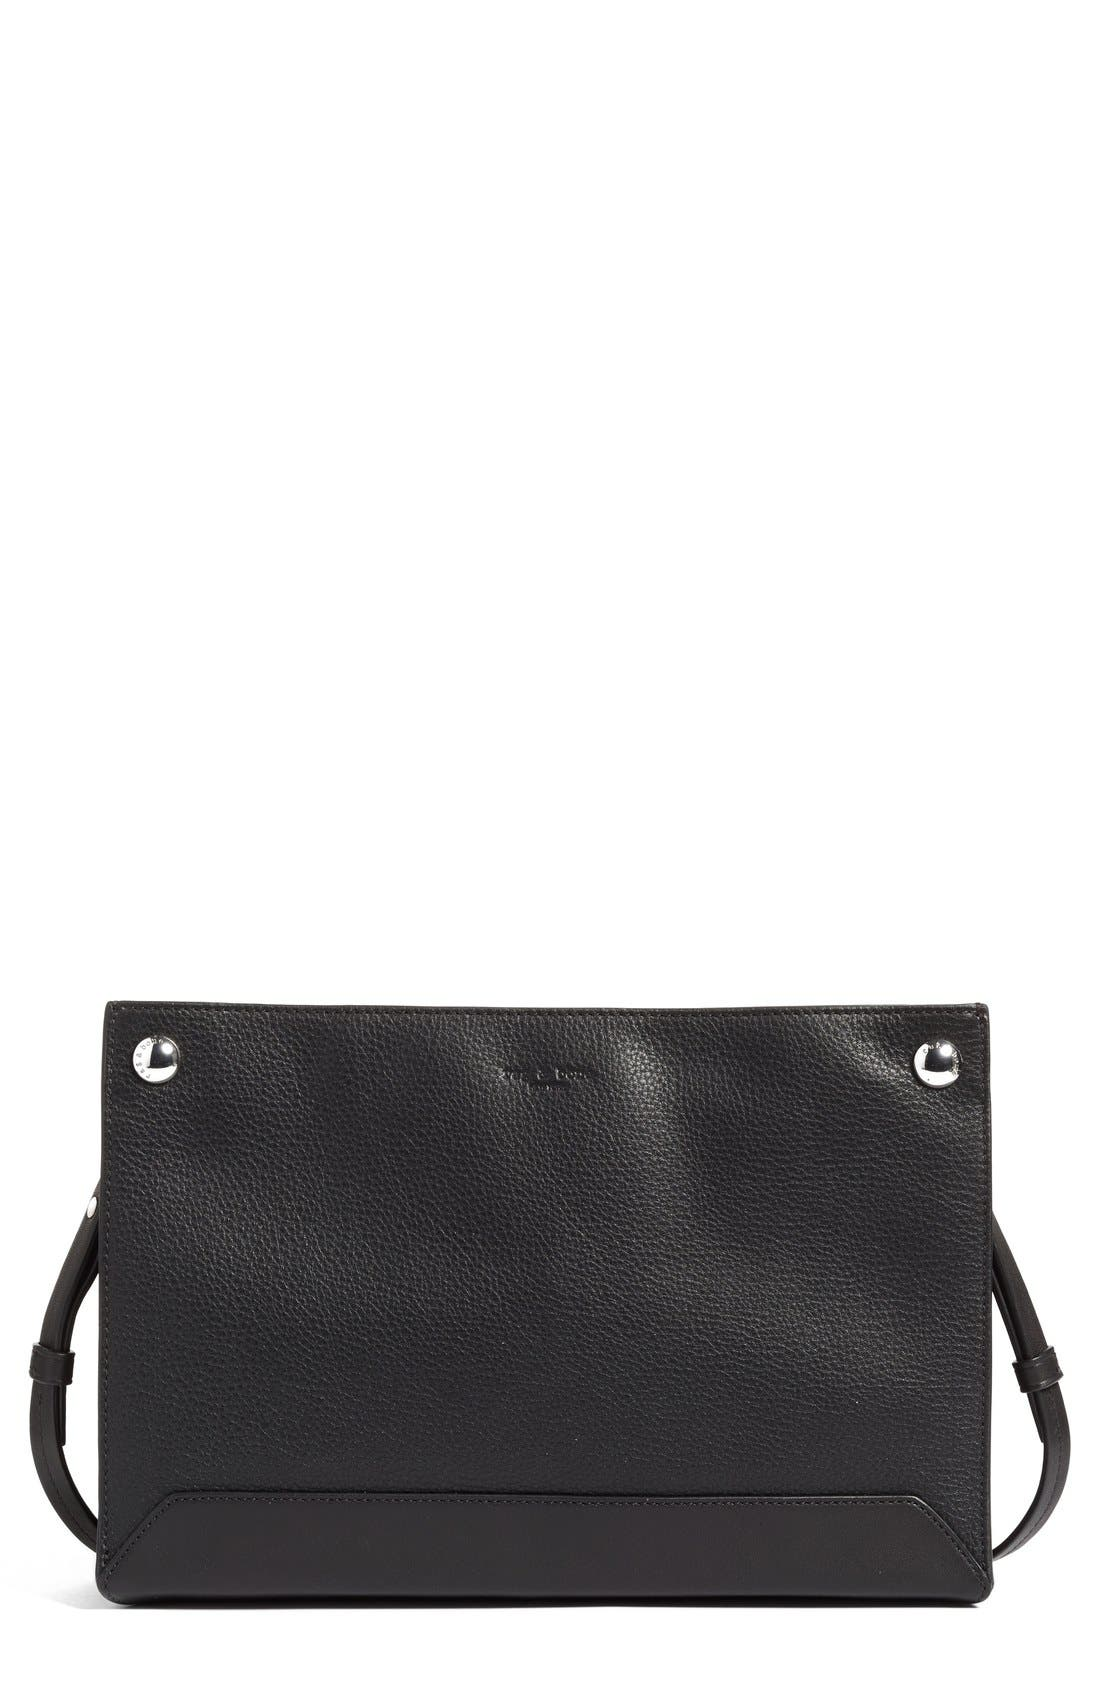 Compass Leather Crossbody Bag,                             Main thumbnail 1, color,                             BLACK